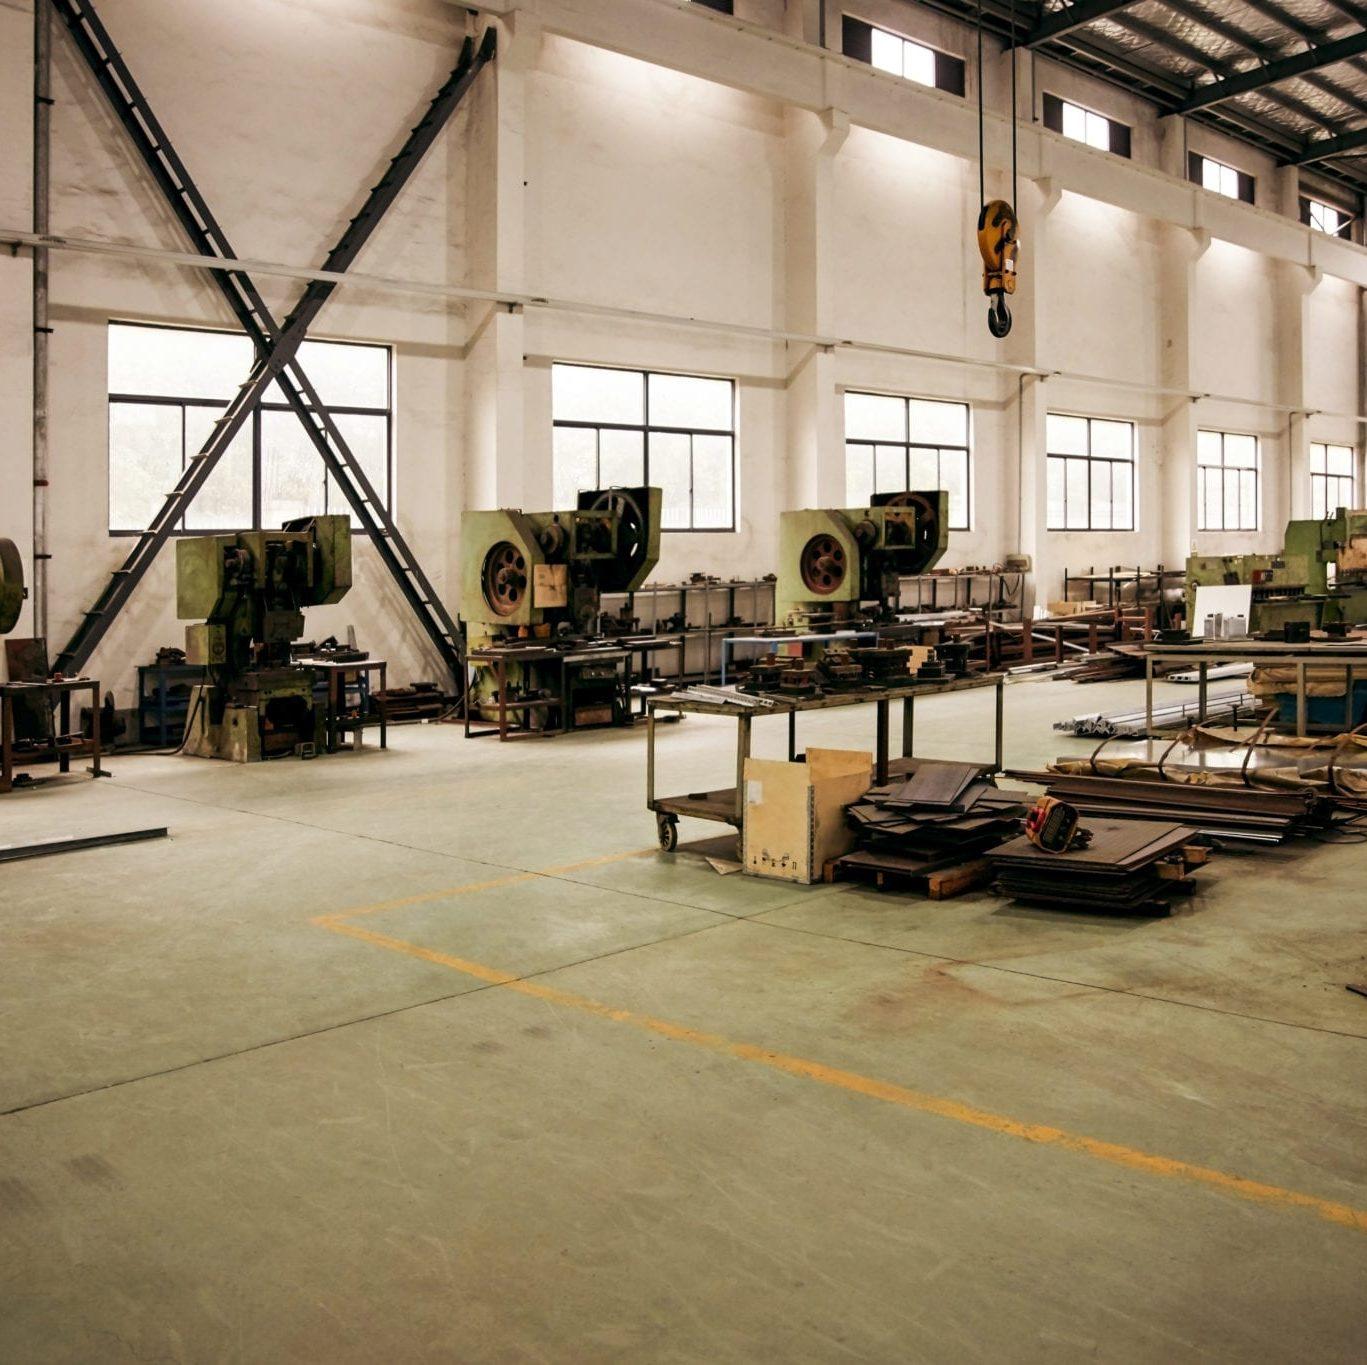 Pre-Fab Metal Warehouse